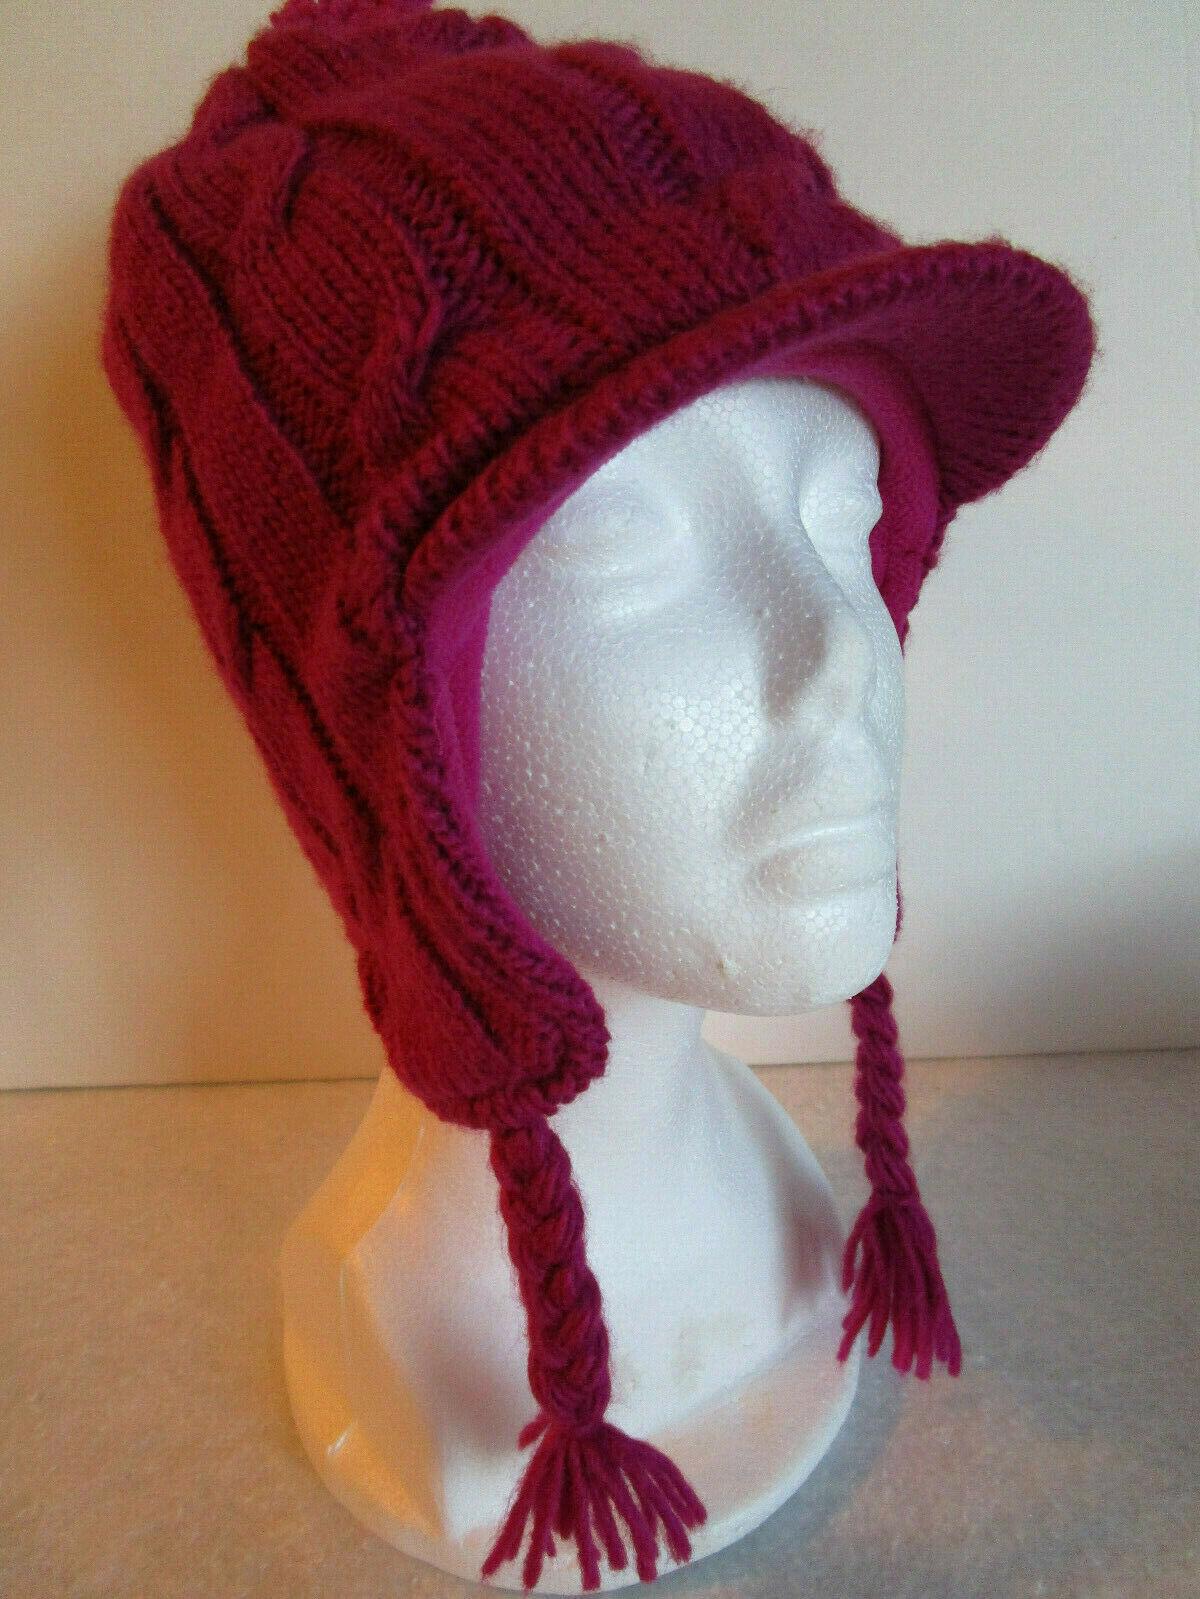 PLACE Knit Hat POM POM Ear Flaps VISOR lined - Raspberry Pink Girls 7-8 - $4.69